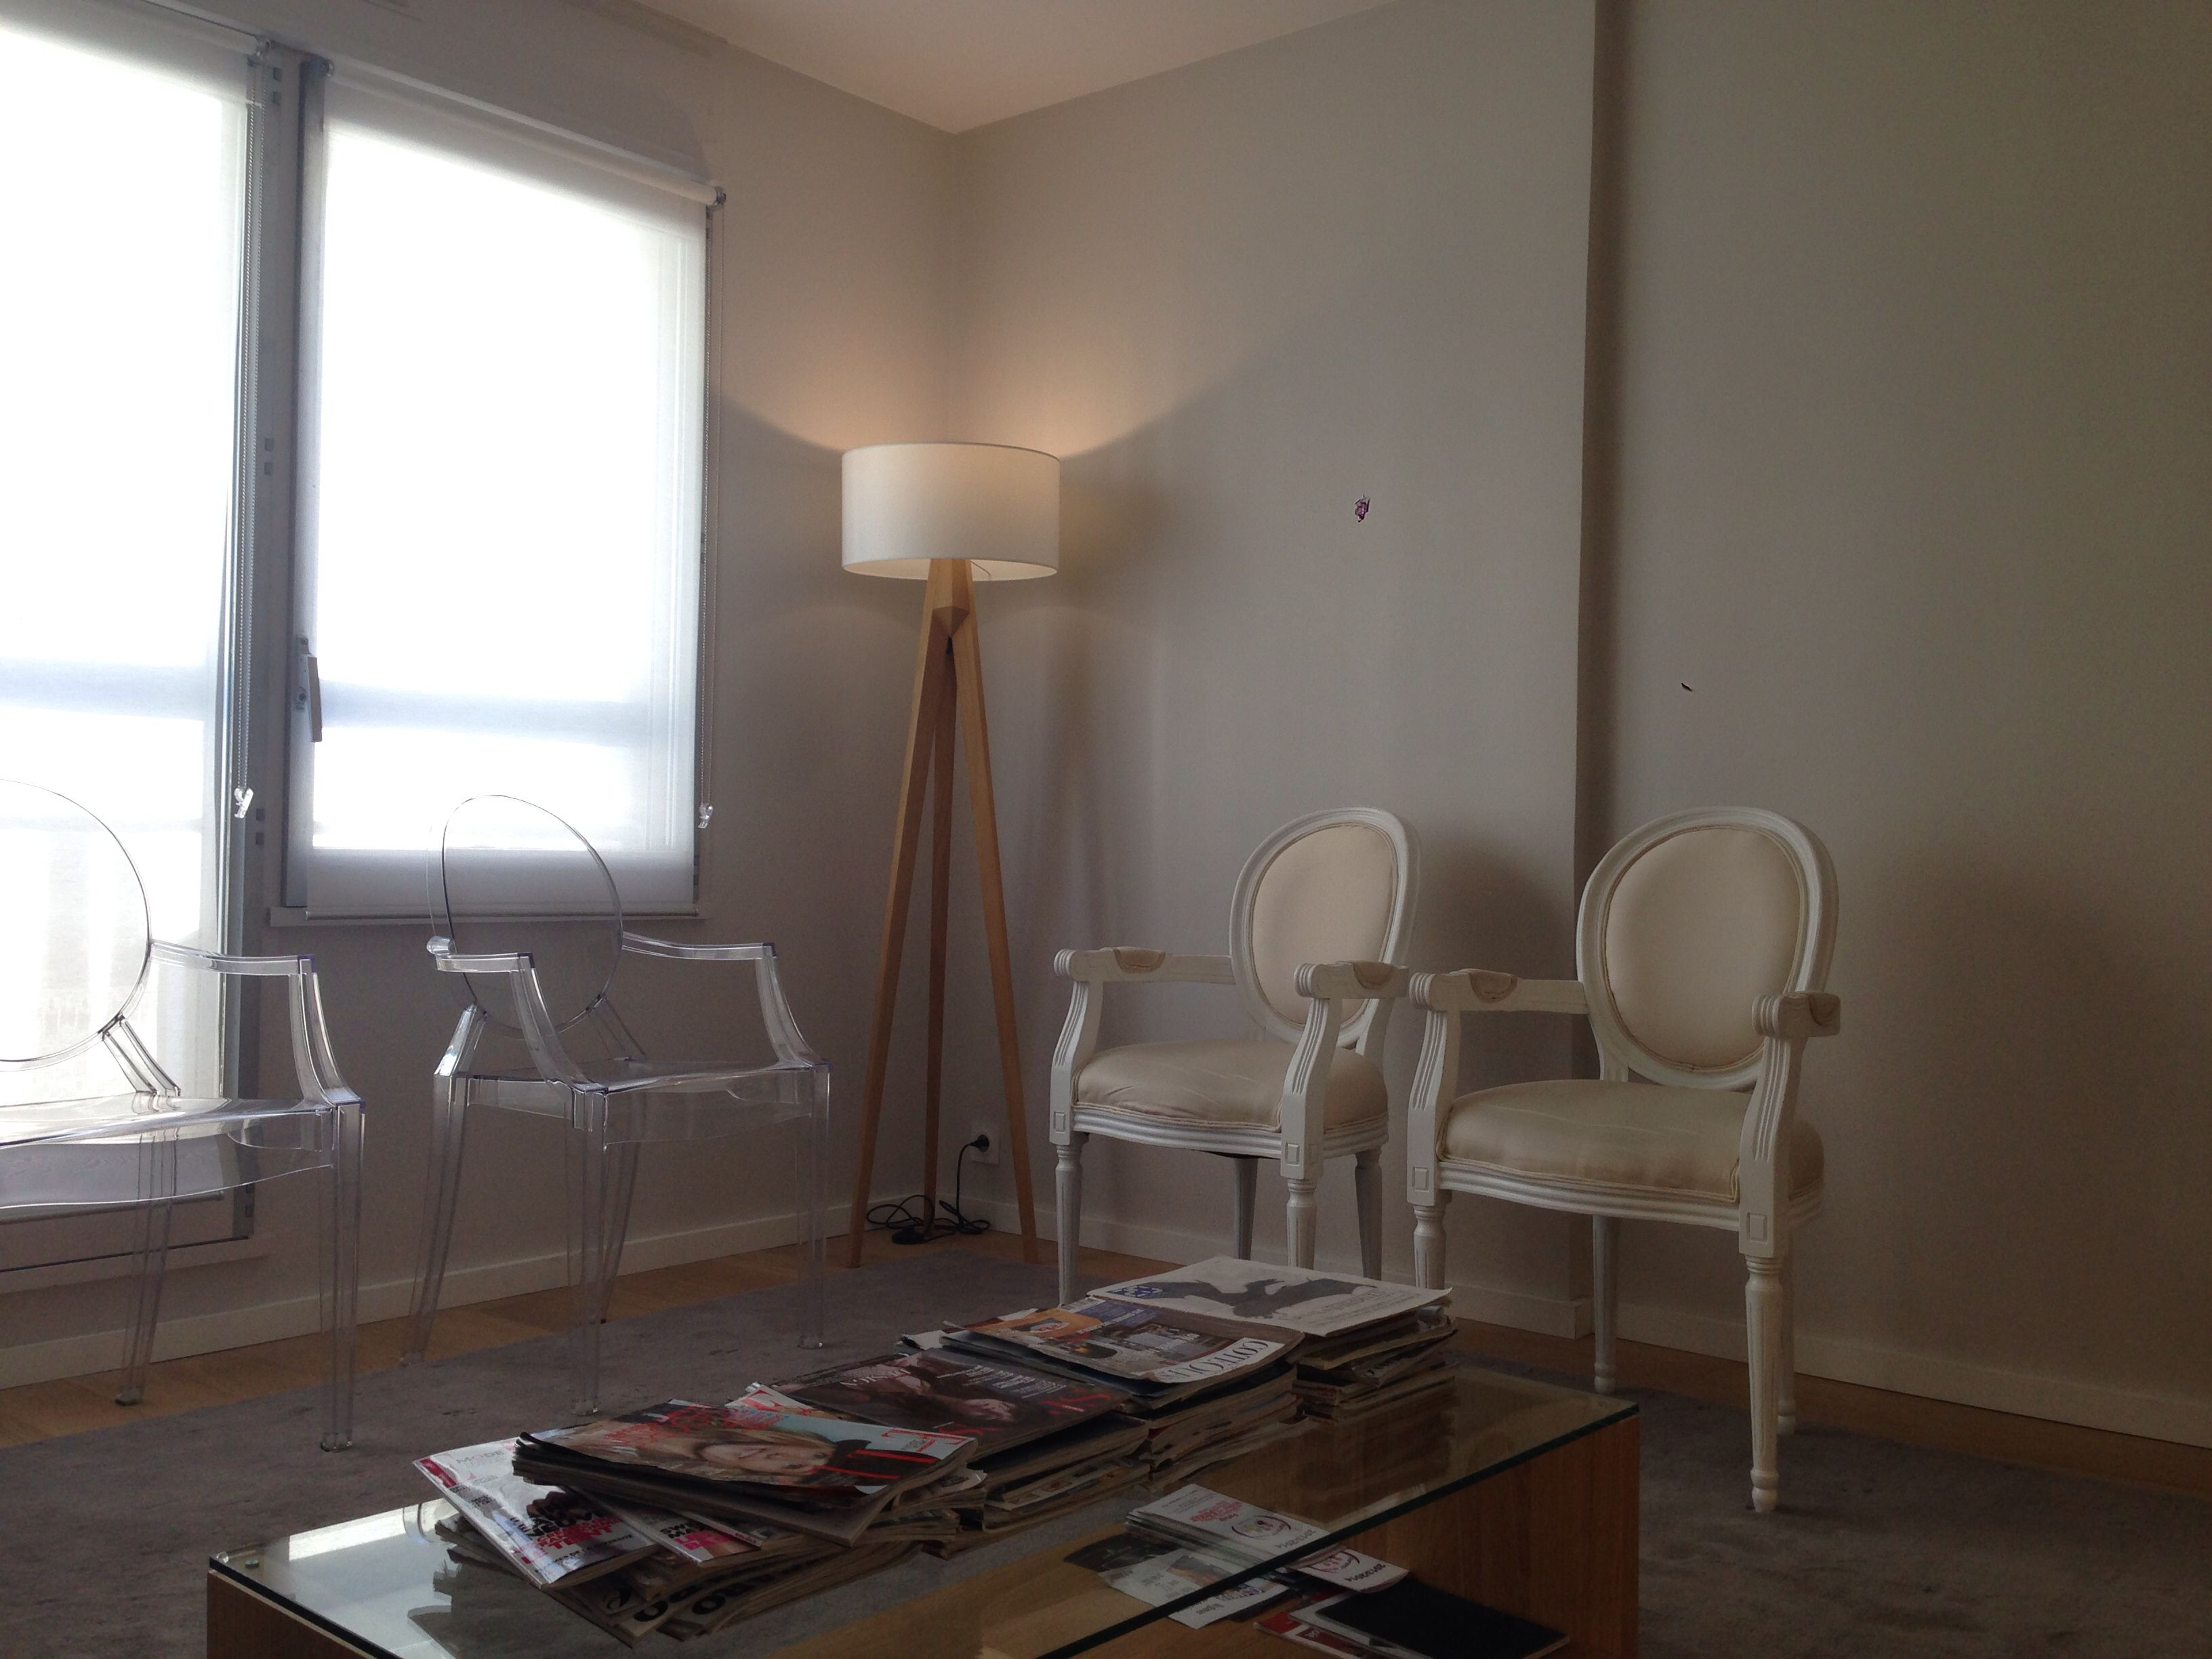 salle d 39 attente cabinet m dical salle d 39 attente. Black Bedroom Furniture Sets. Home Design Ideas